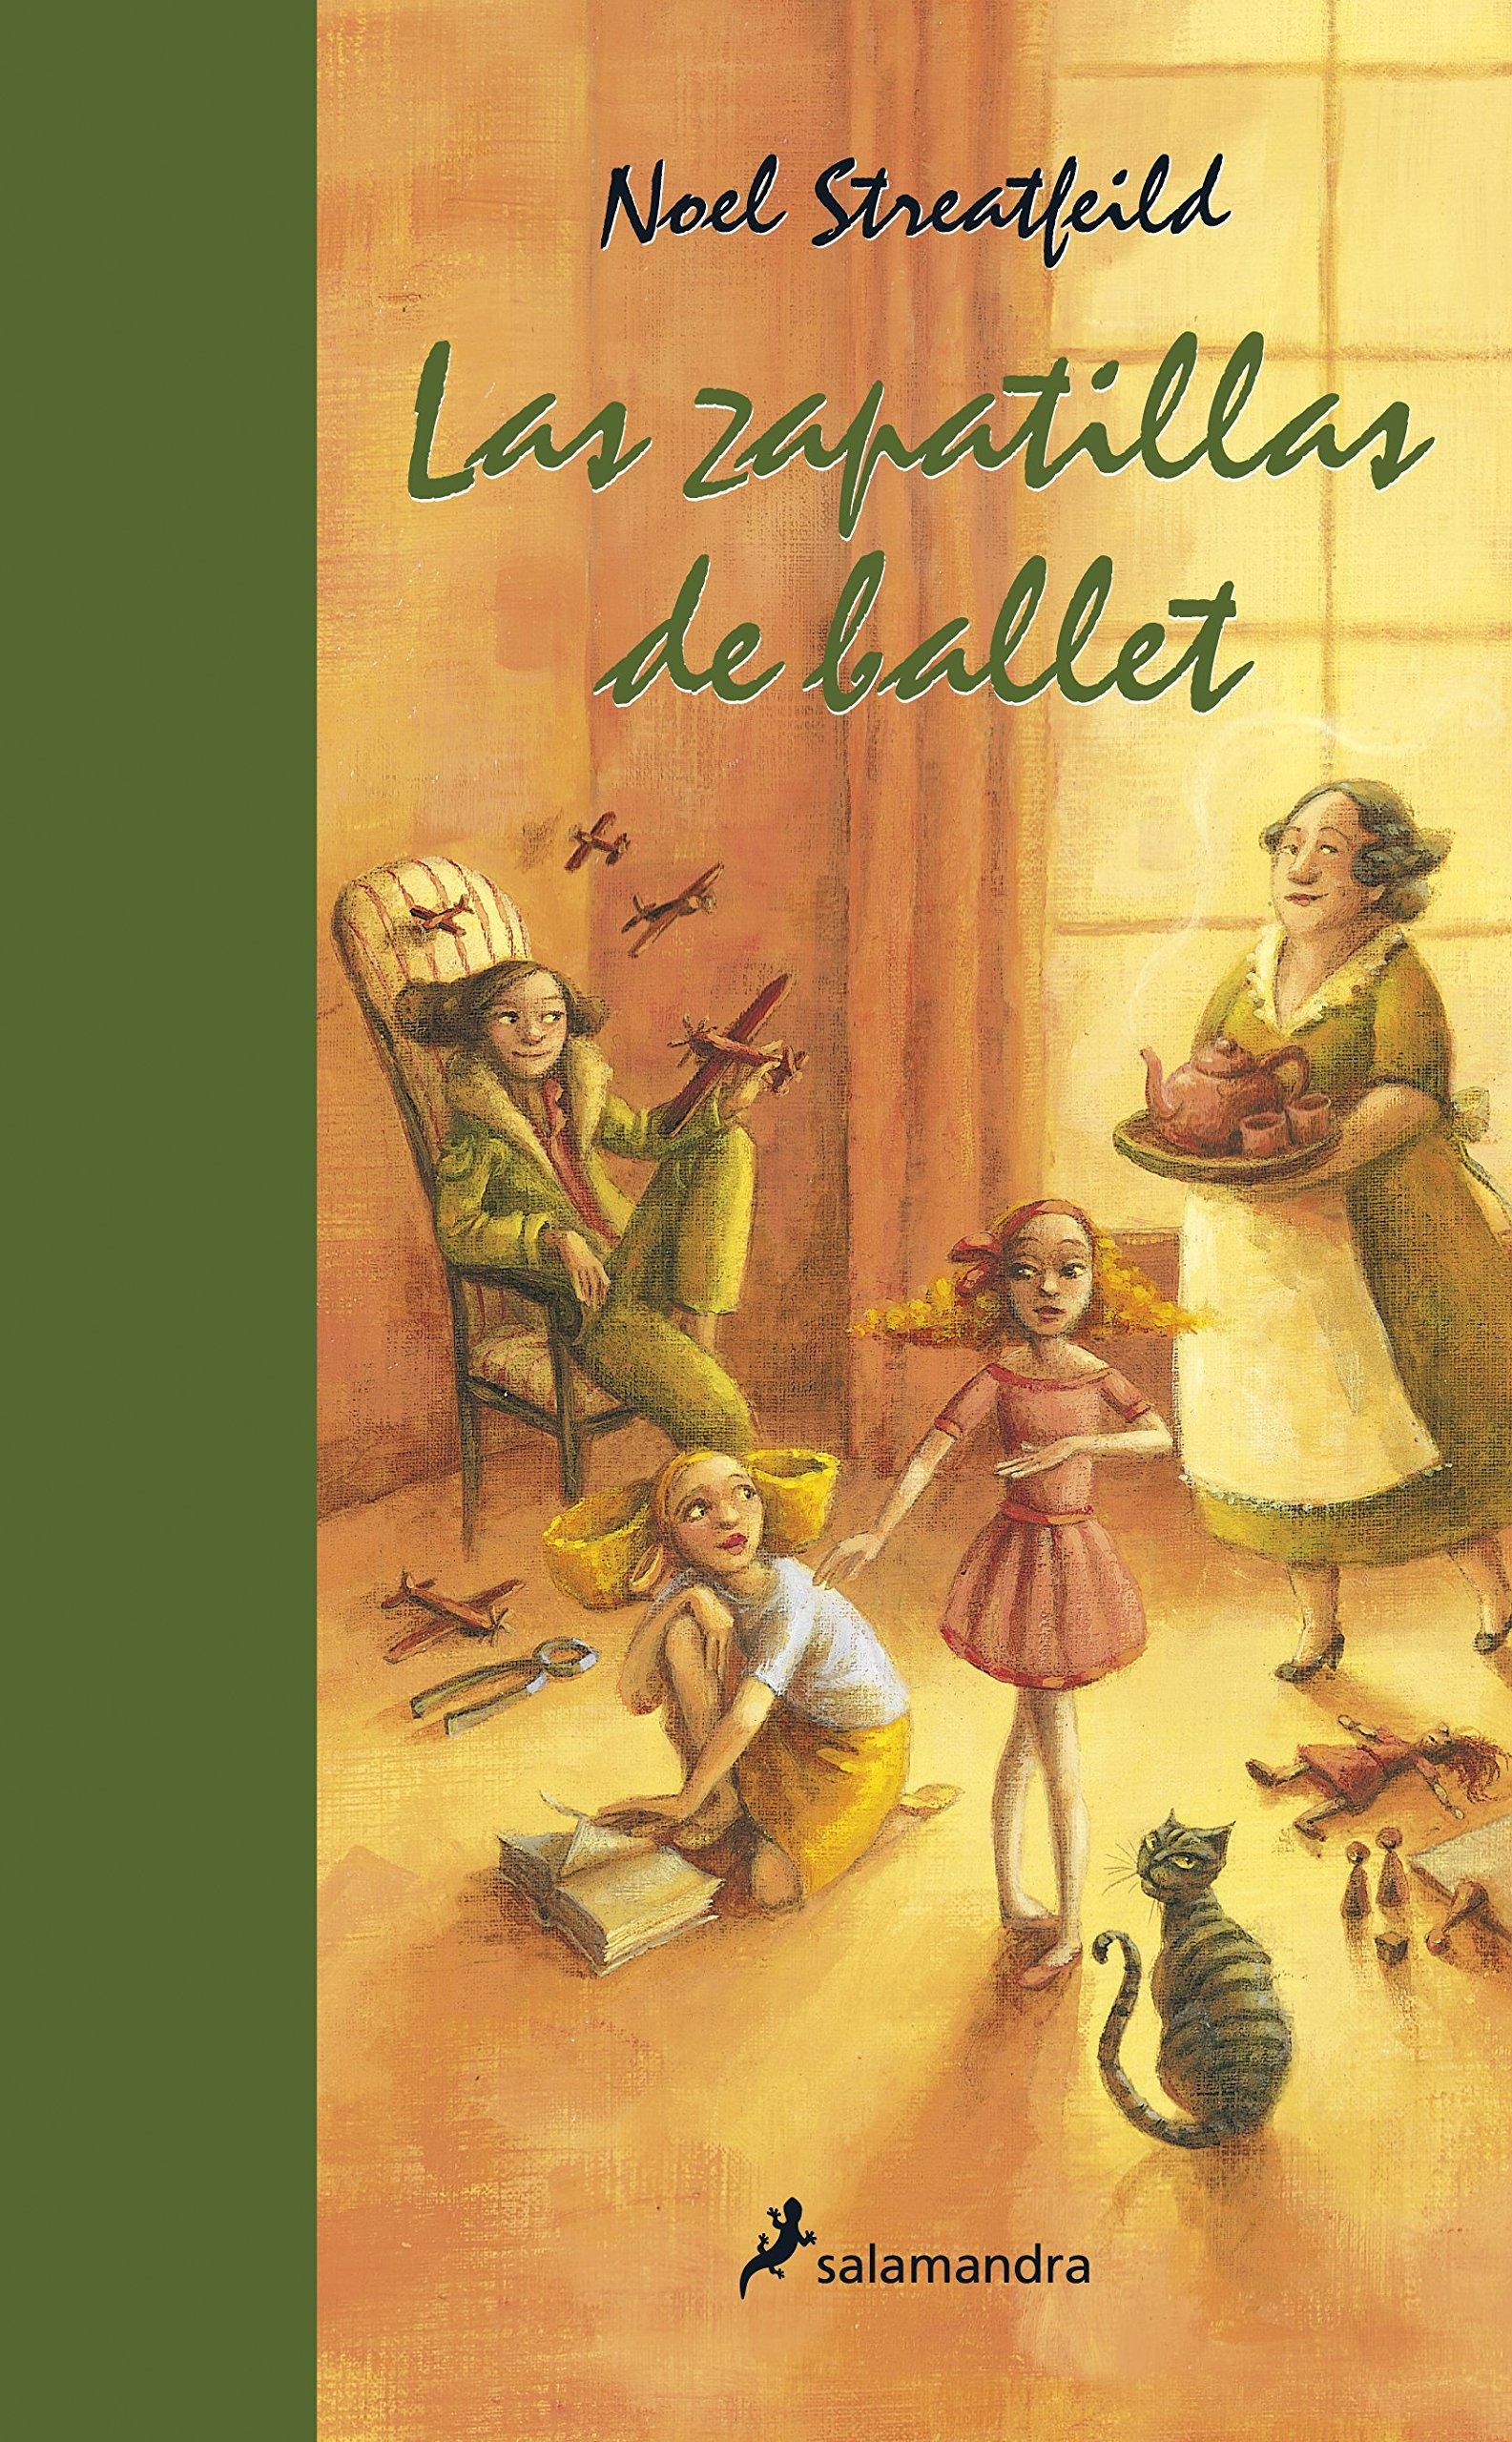 Zapatillas de ballet, Las (Spanish Edition) (Spanish) Hardcover – September 18, 2015